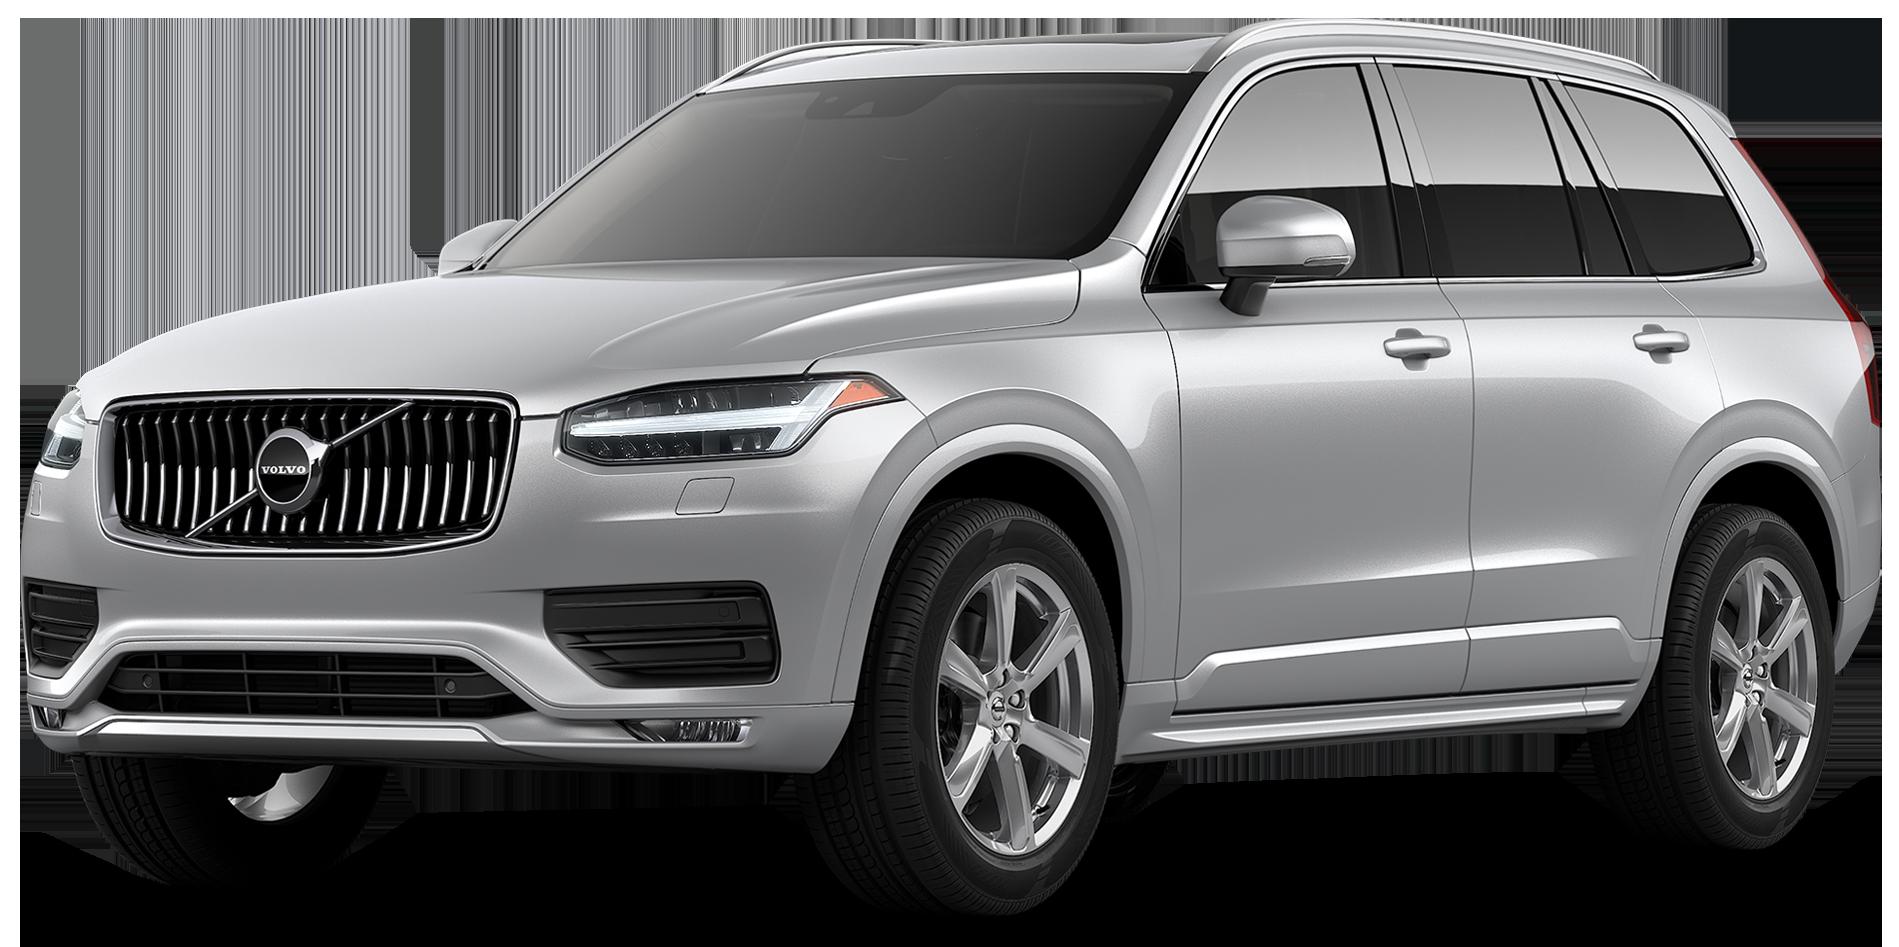 2021 Volvo XC90 Incentives, Specials & Offers in Palo Alto CA